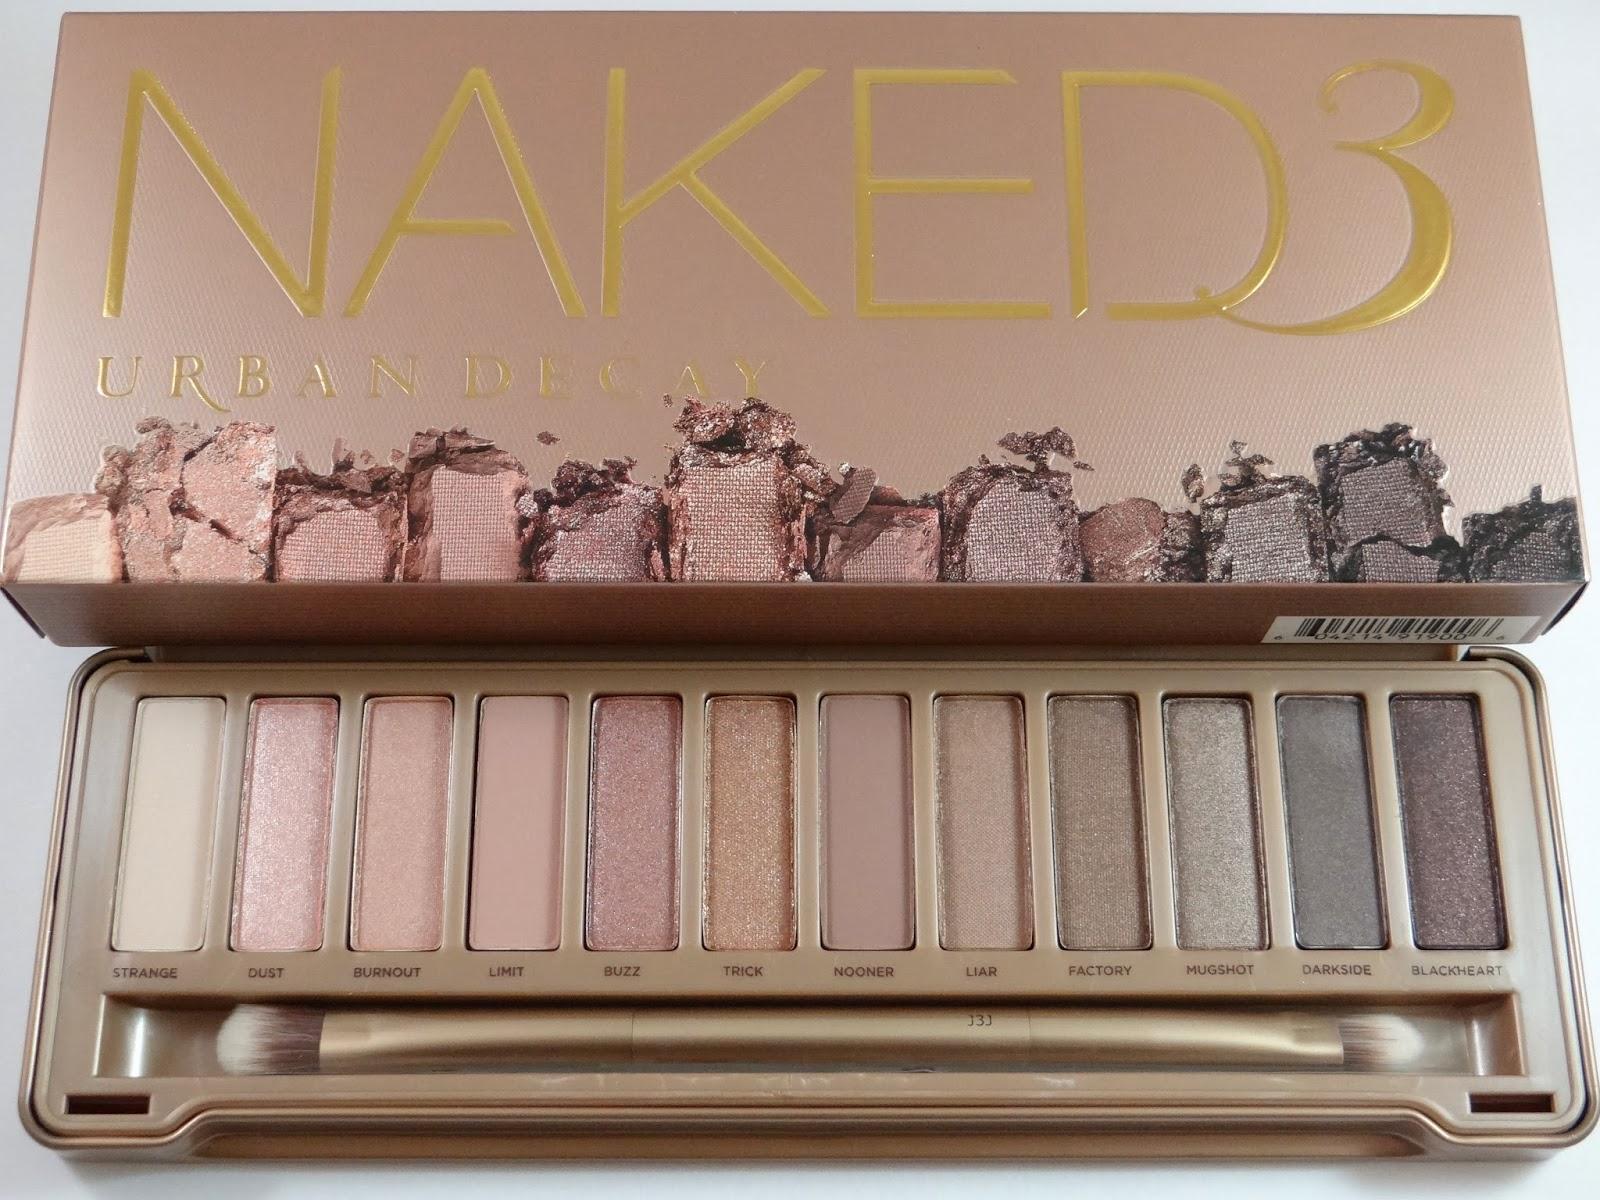 Urban Decay Eyeshadow Naked3 strange,dust,burnout,limit